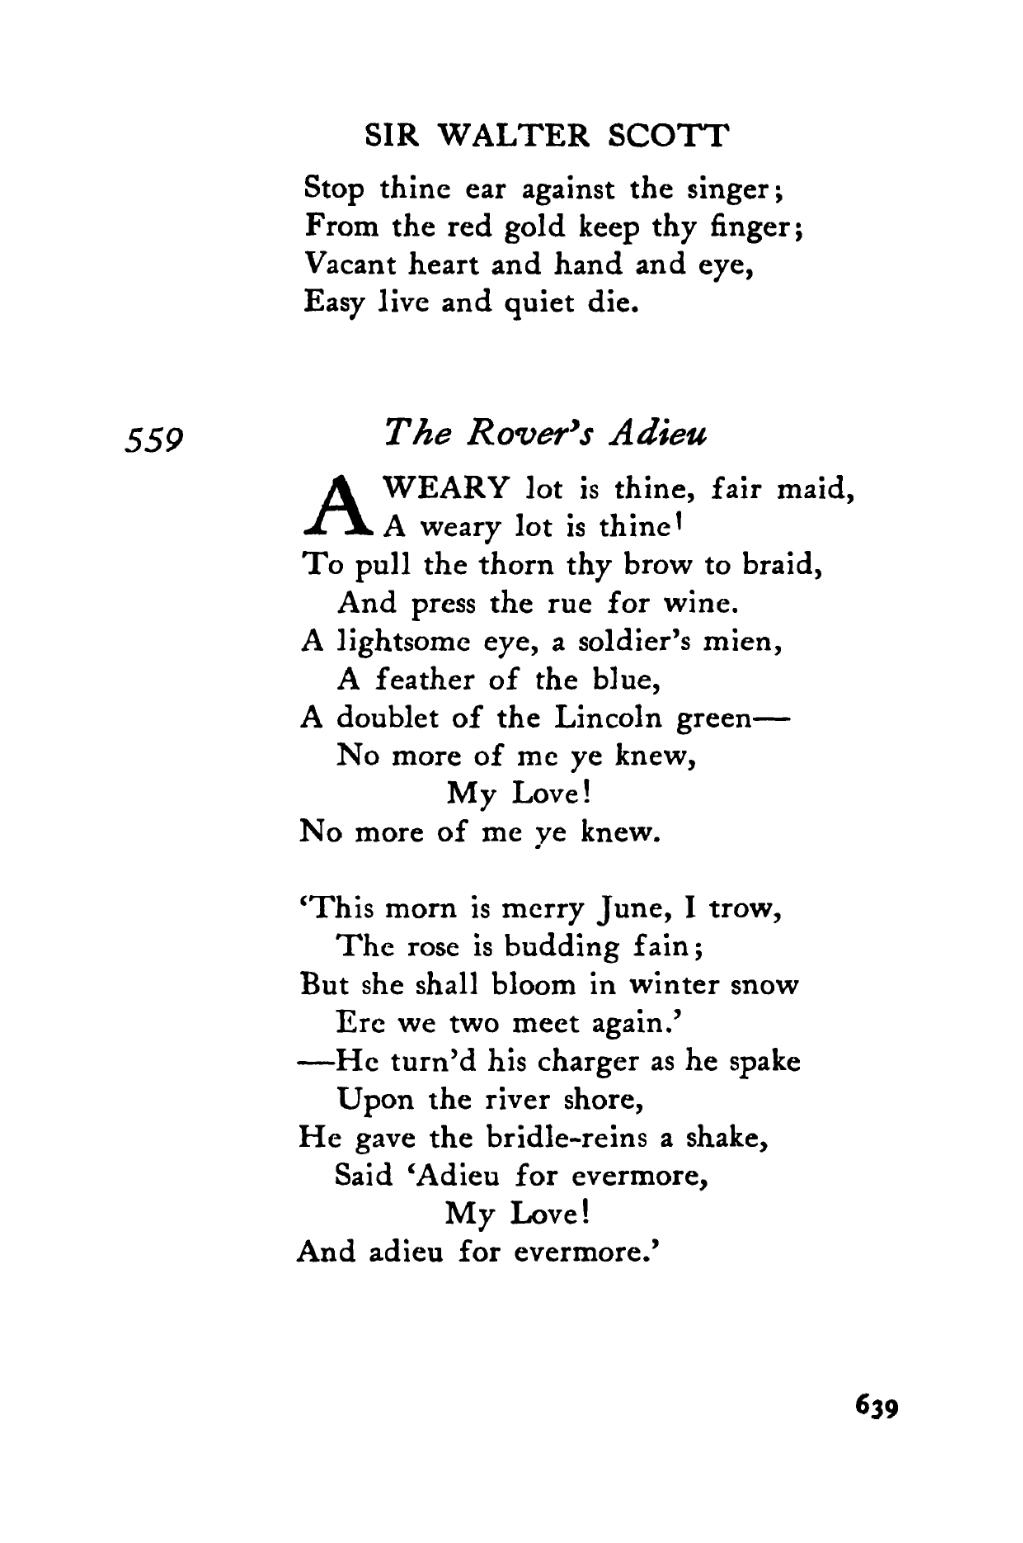 Oxford Book of English Verse 1250